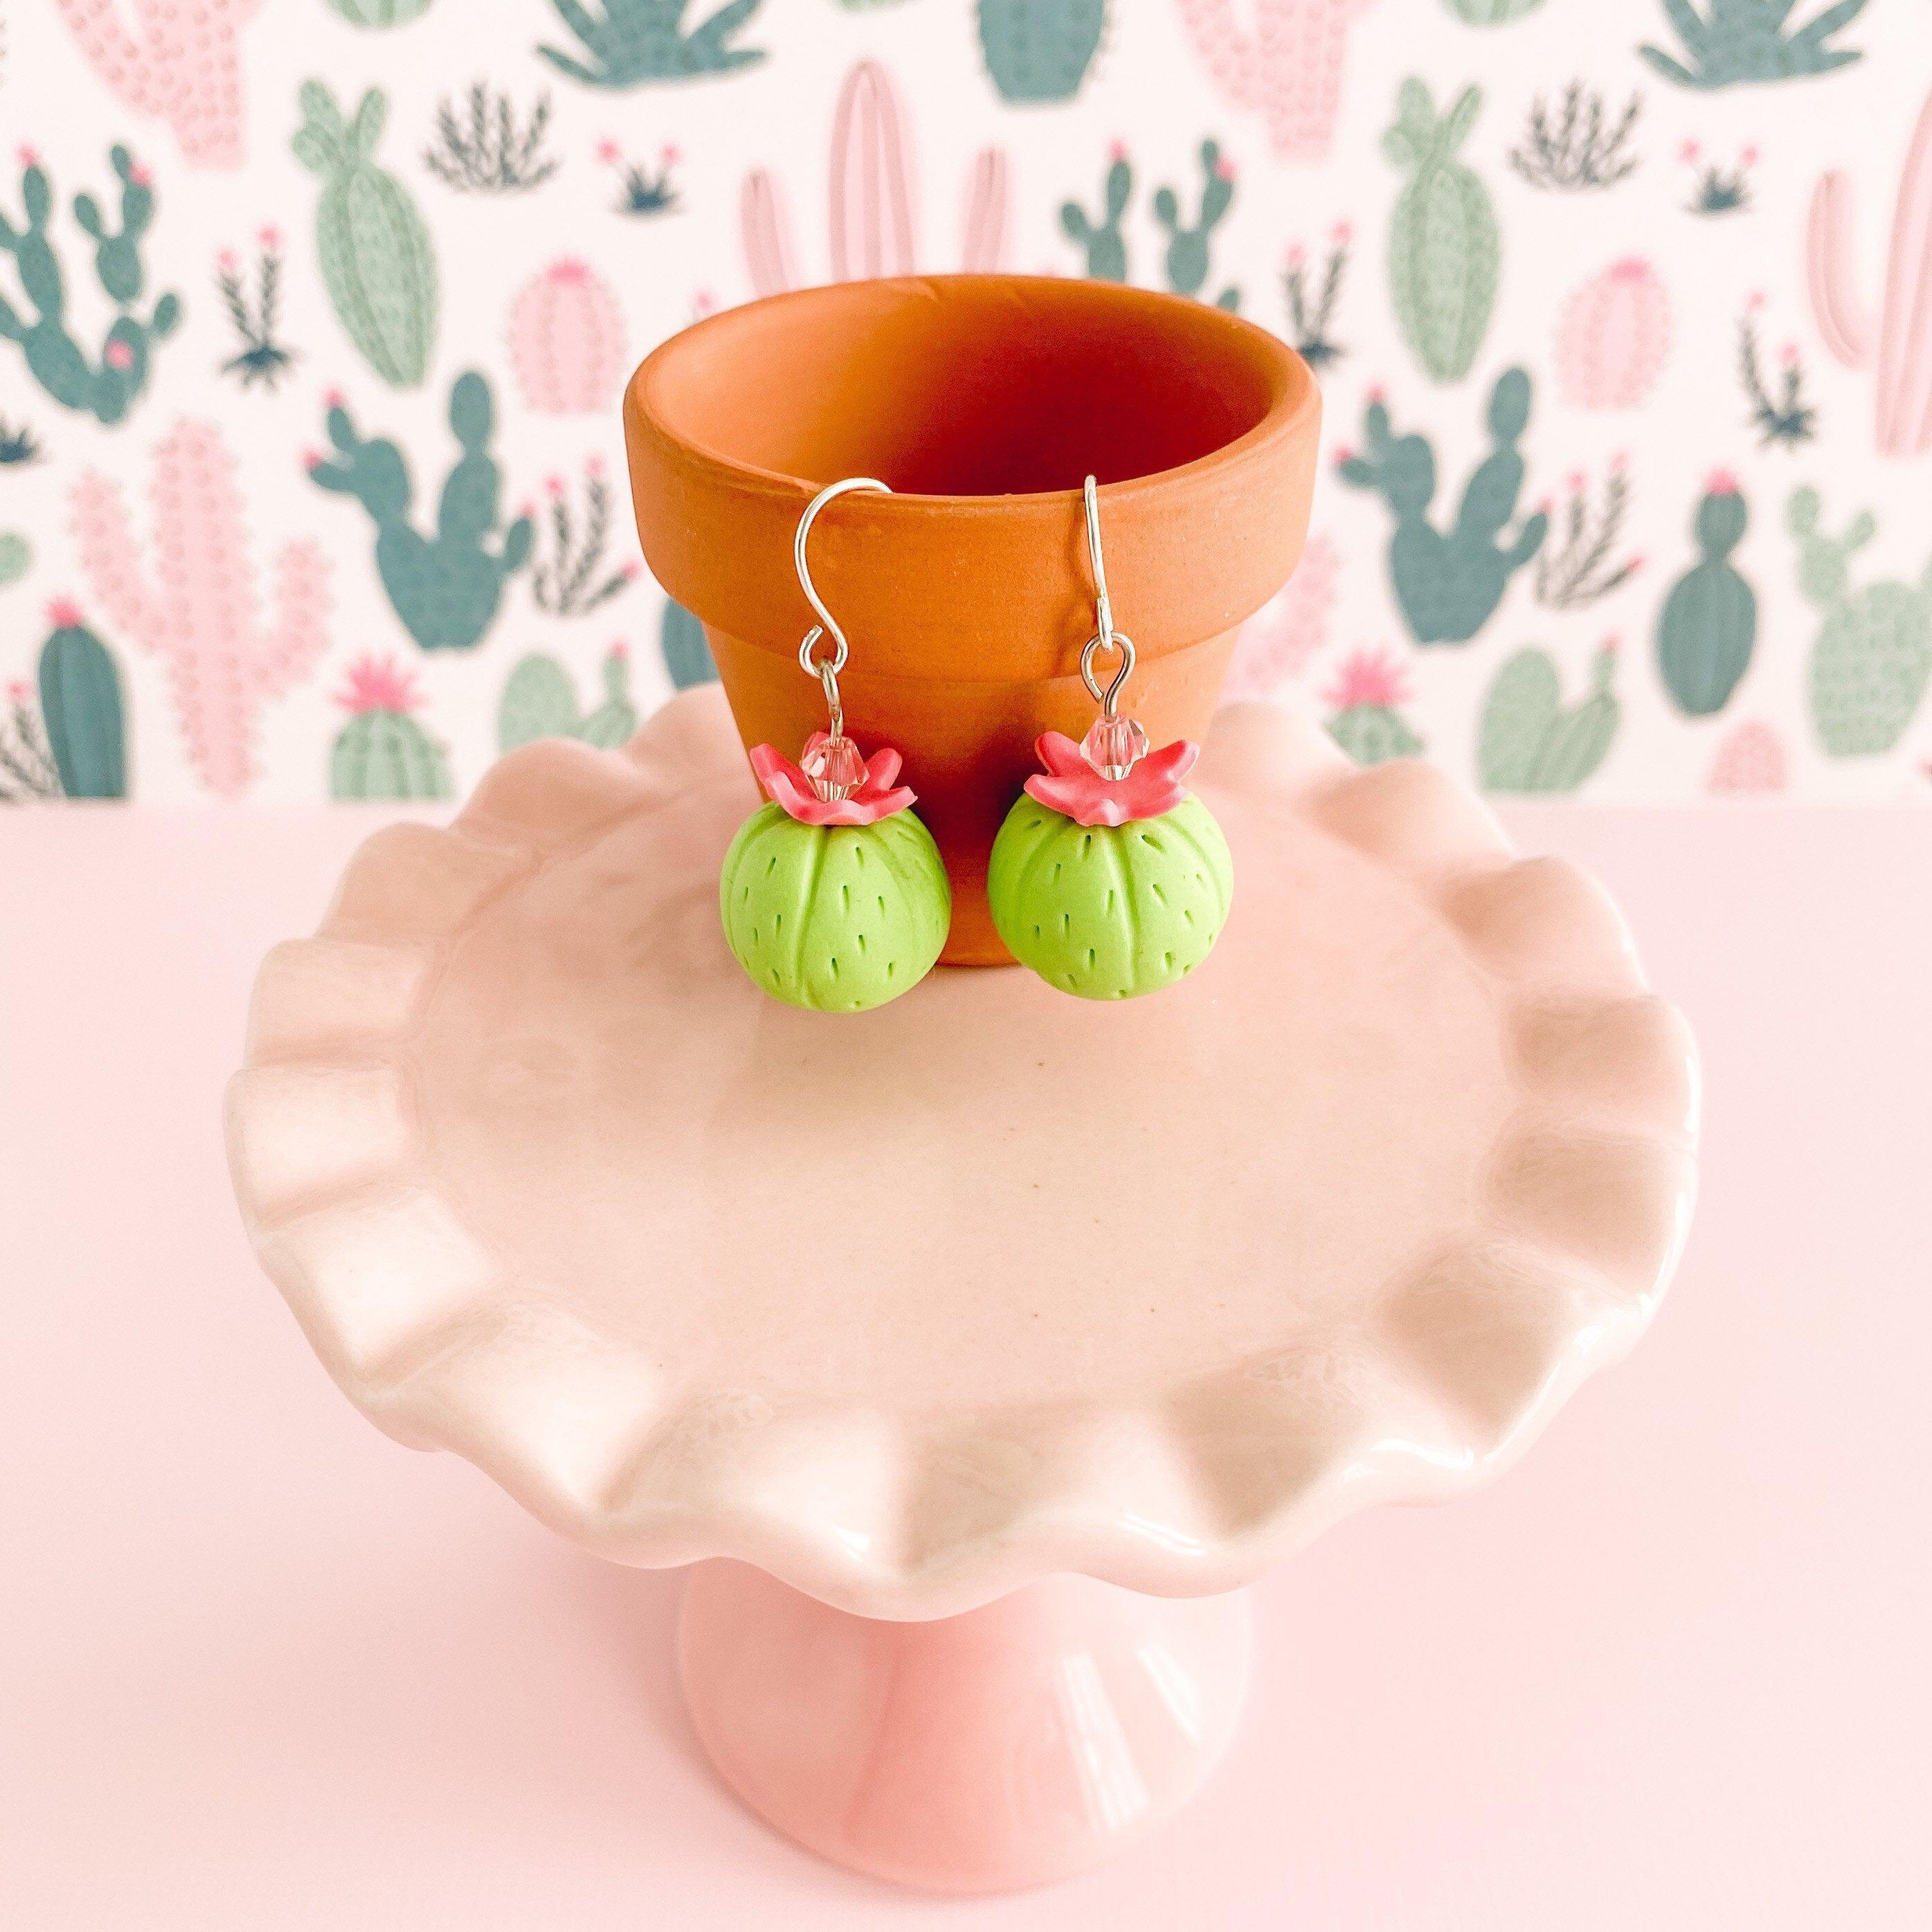 Miniature Barrel Cactus Earrings Hanging from Tiny Terra Cotta Pot